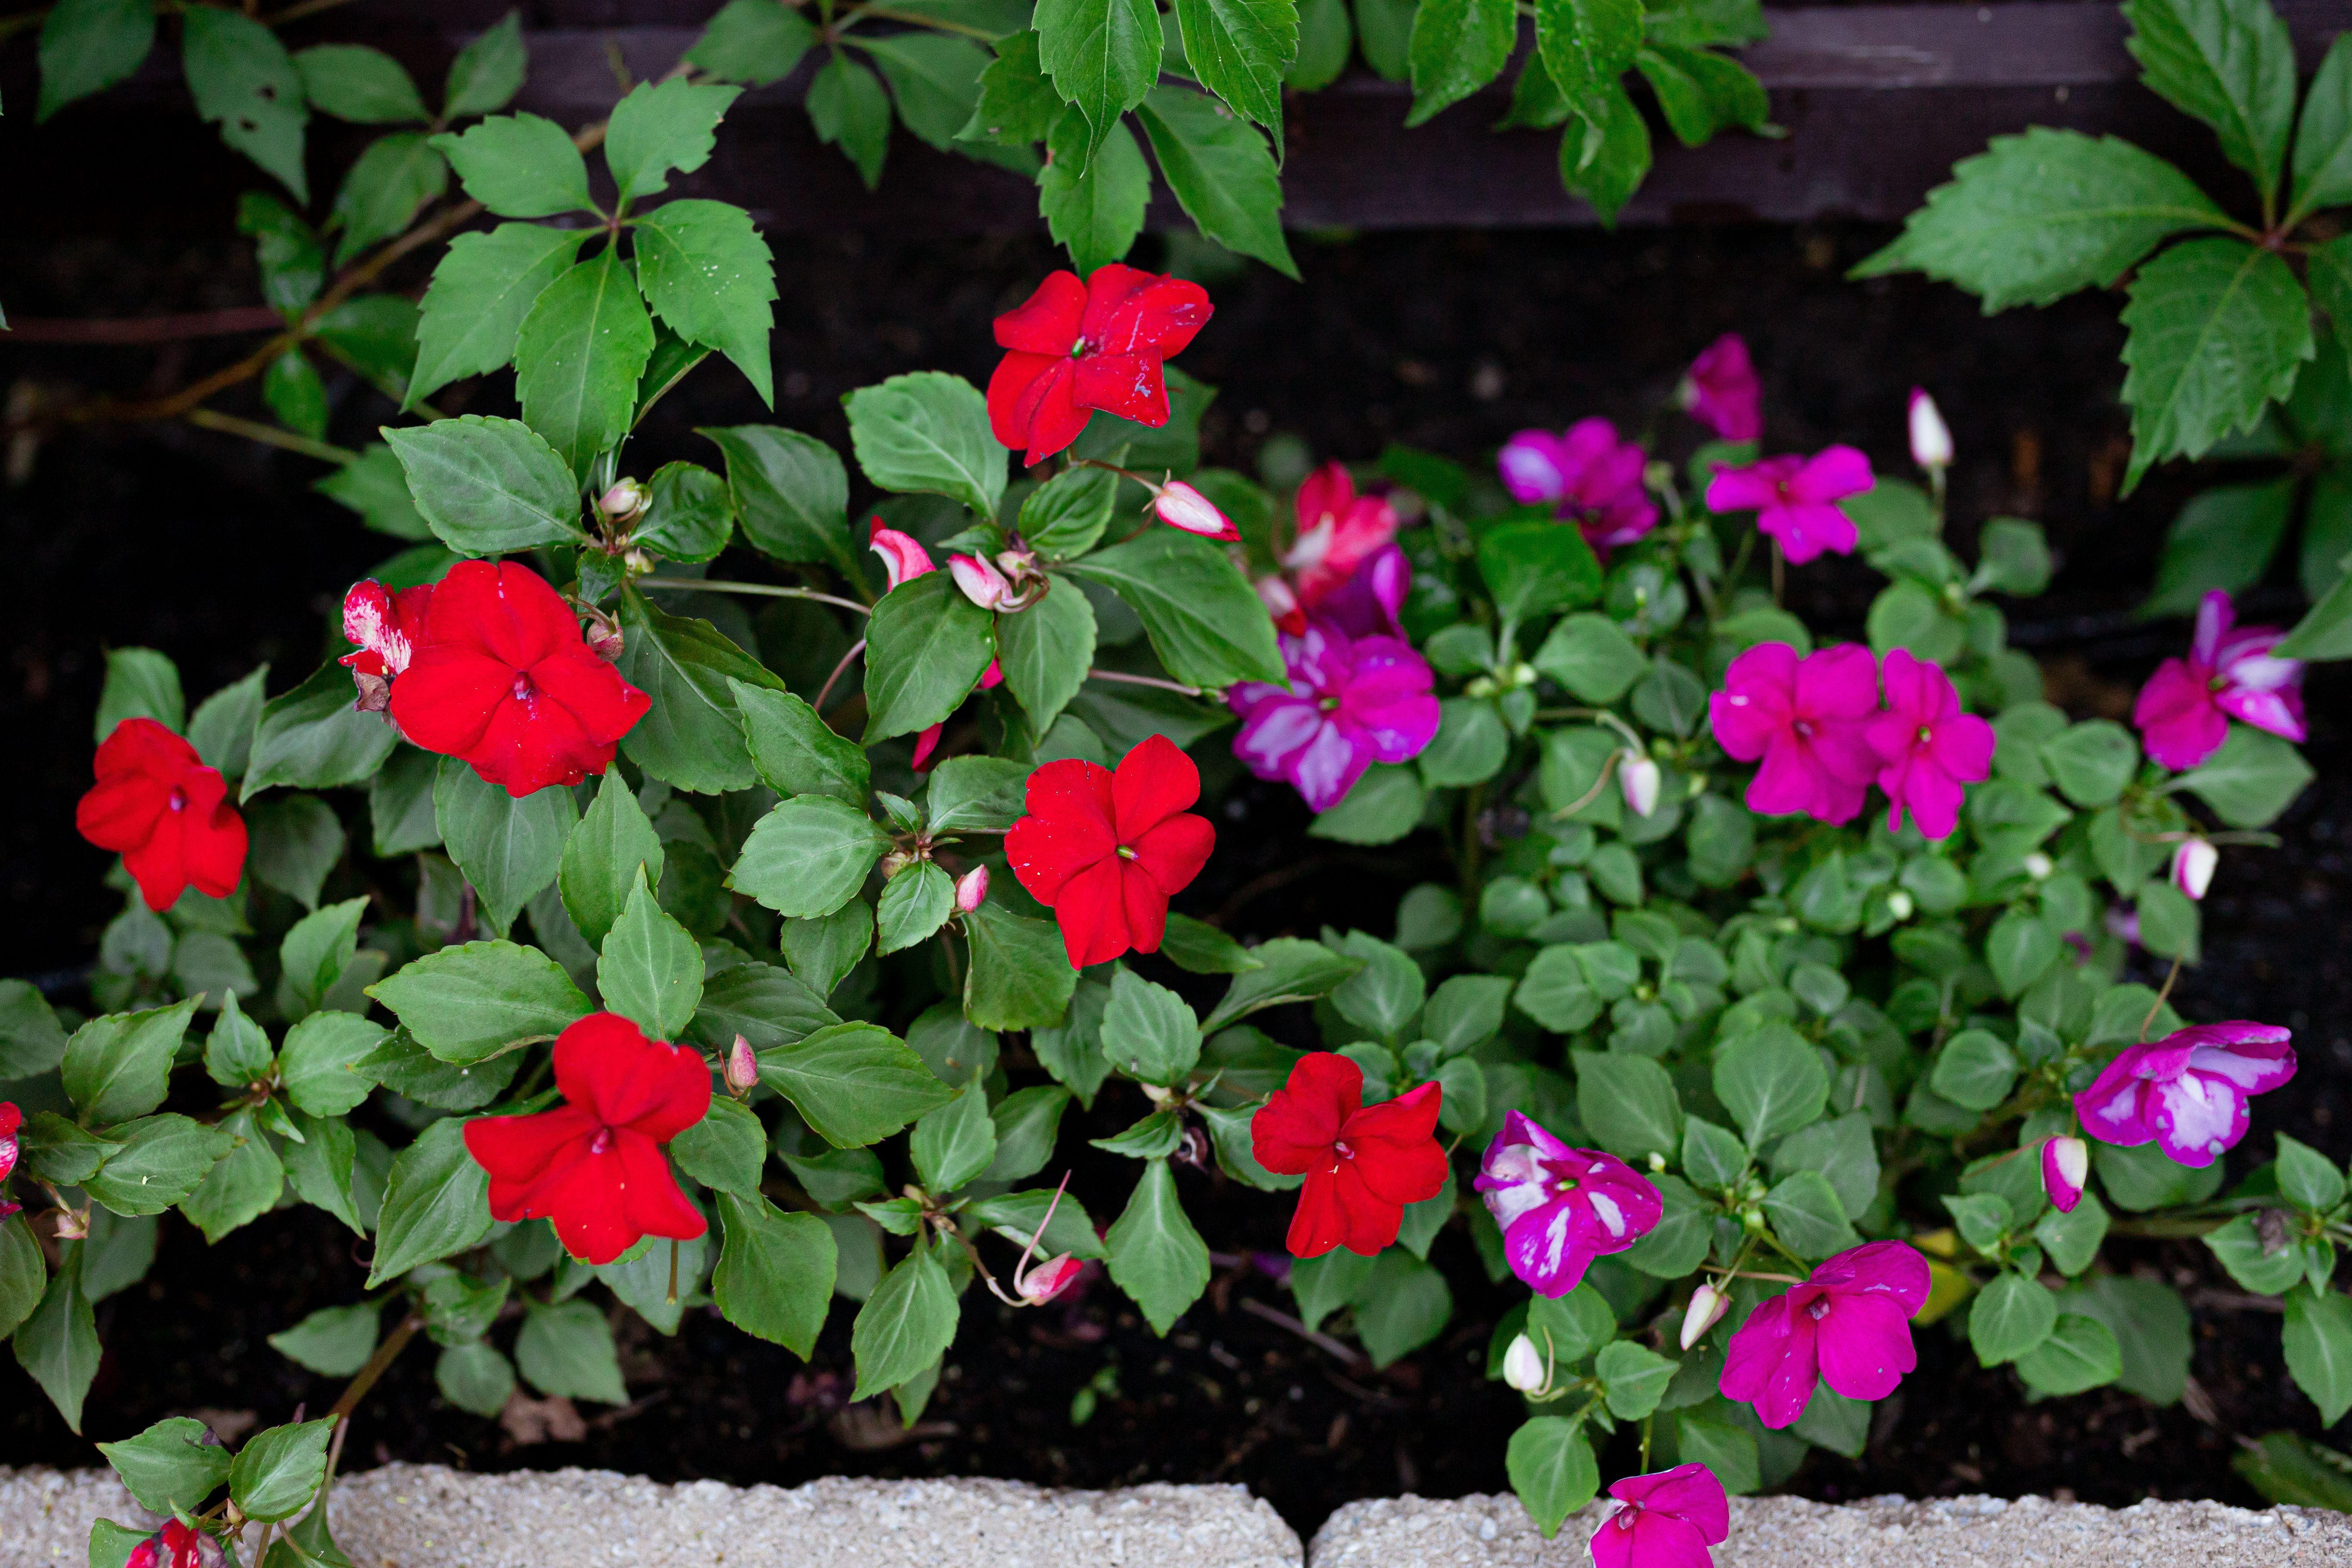 Growing Impatiens Flowers In 2020 Impatiens Flowers Annual Flowers Flowers